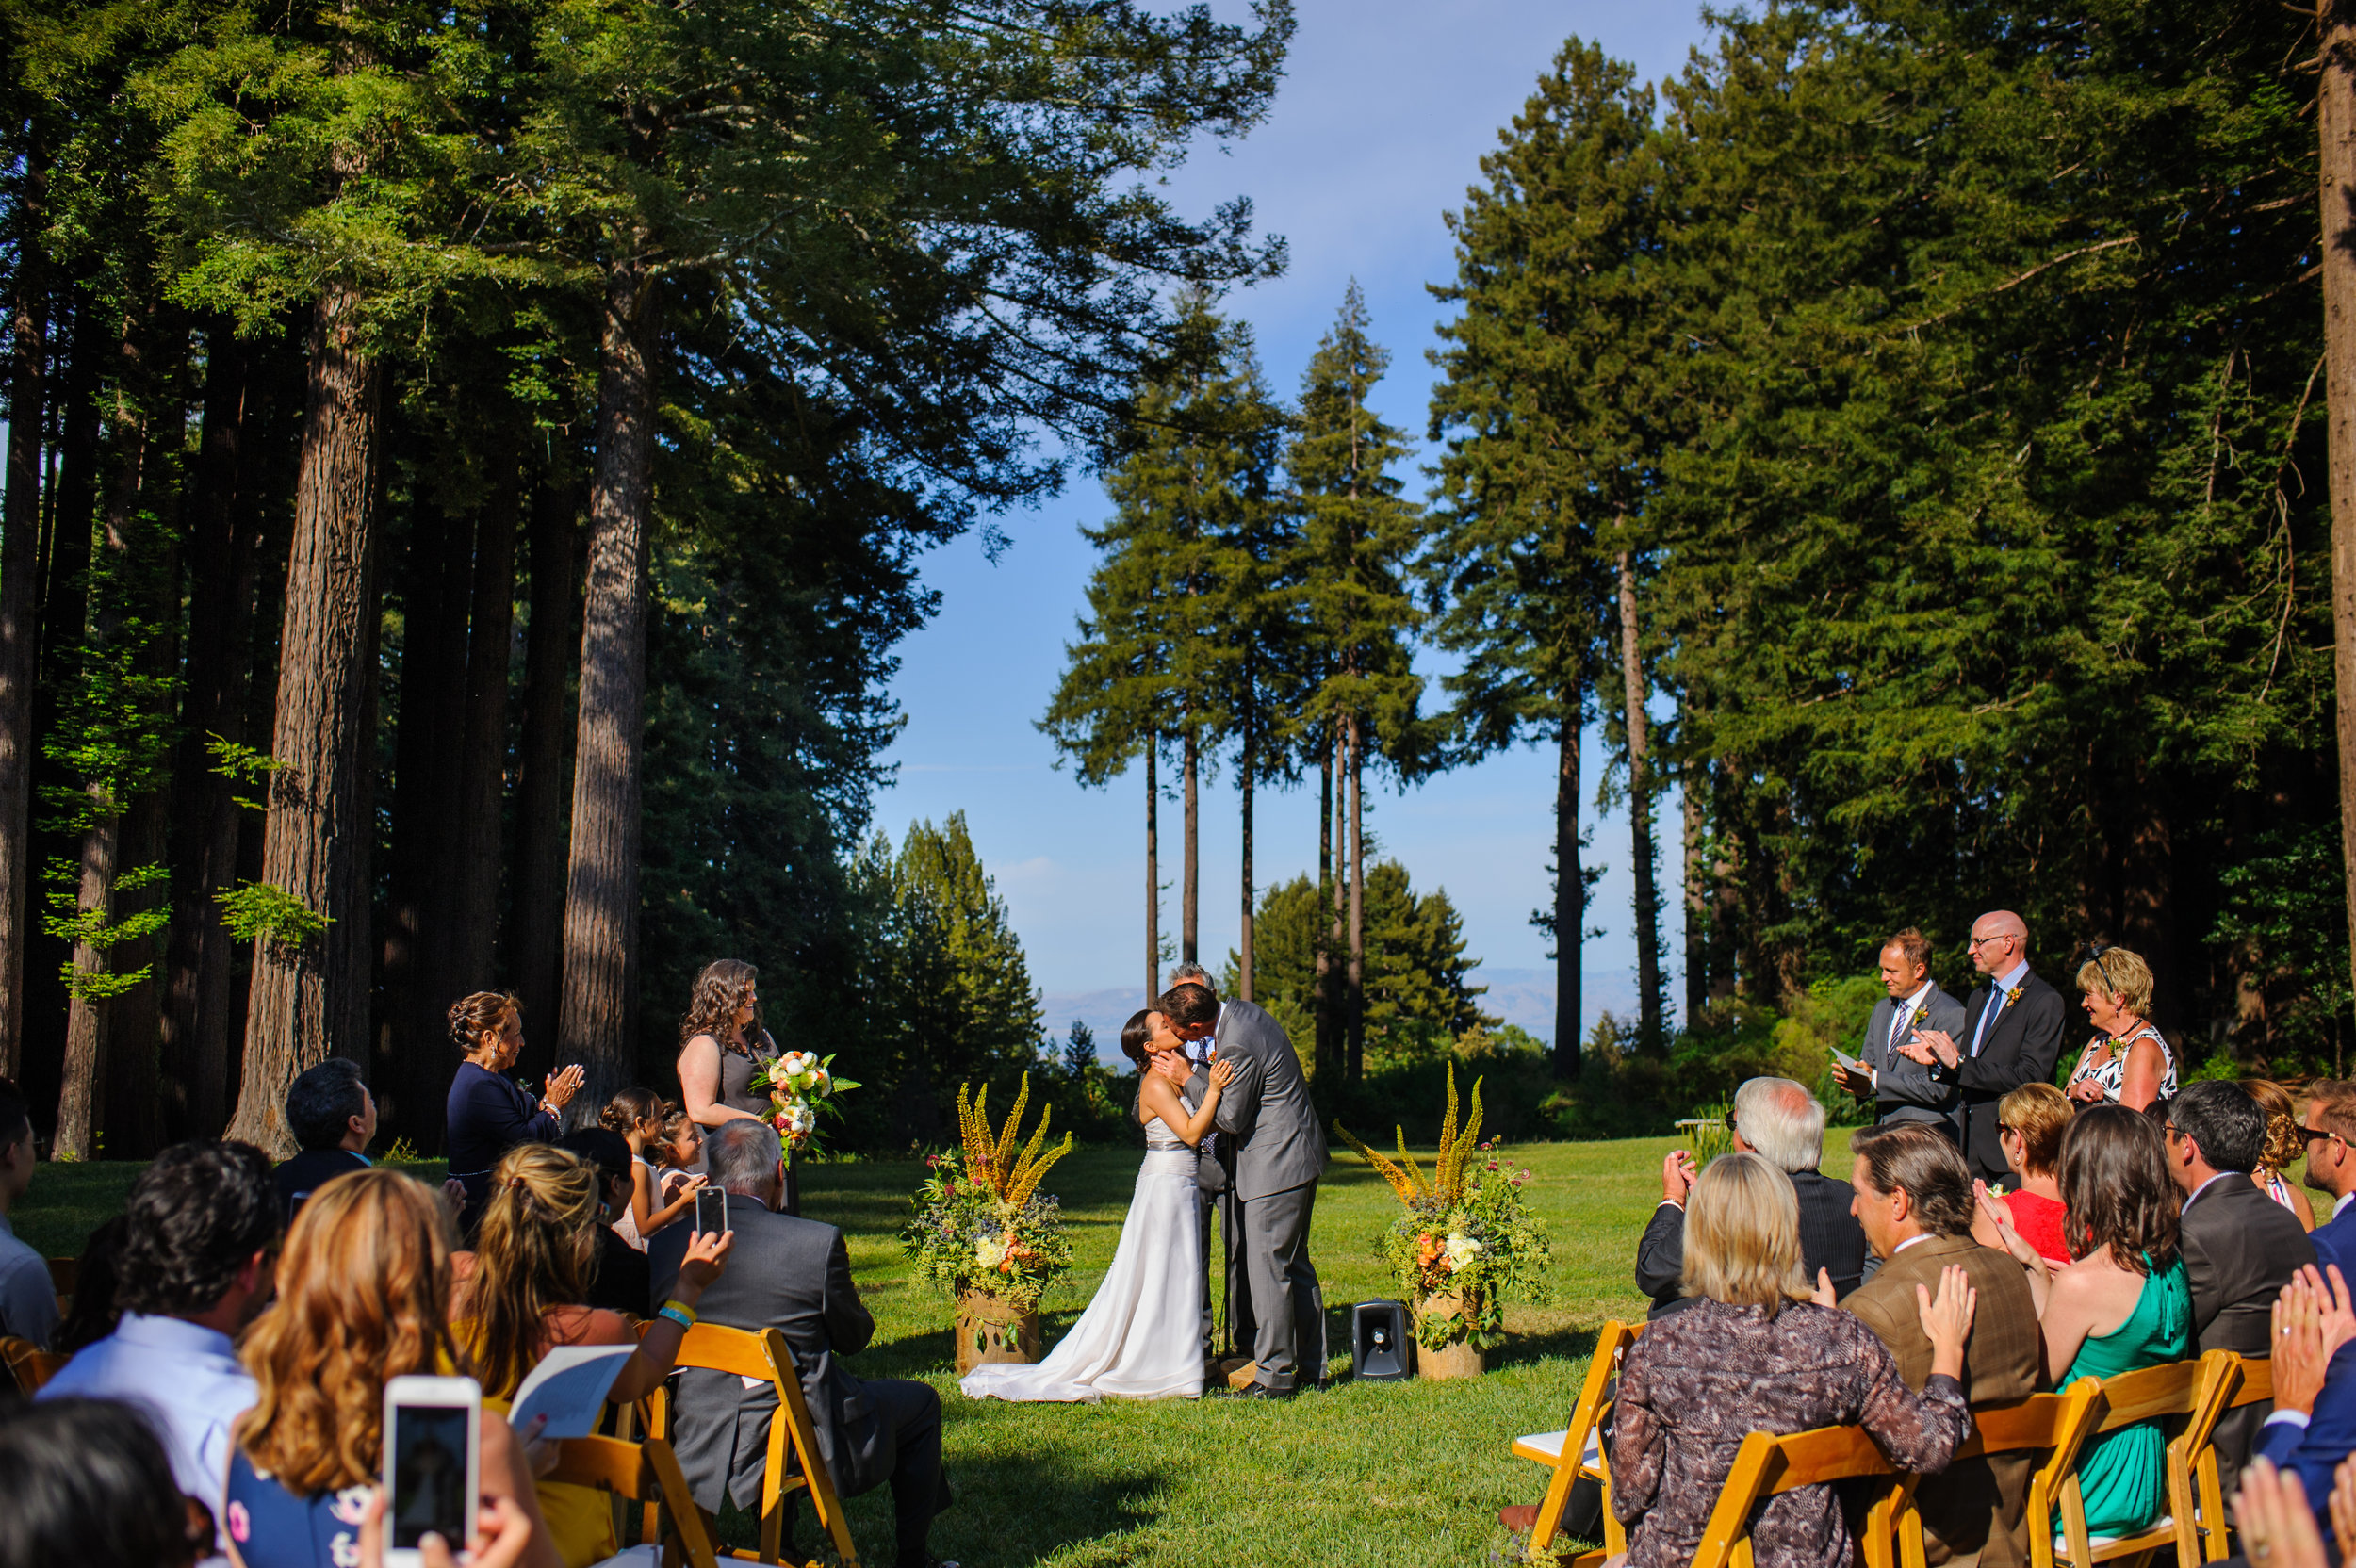 janet-jeremy-024-mountain-terrace-woodside-wedding-photographer-katherine-nicole-photography.JPG